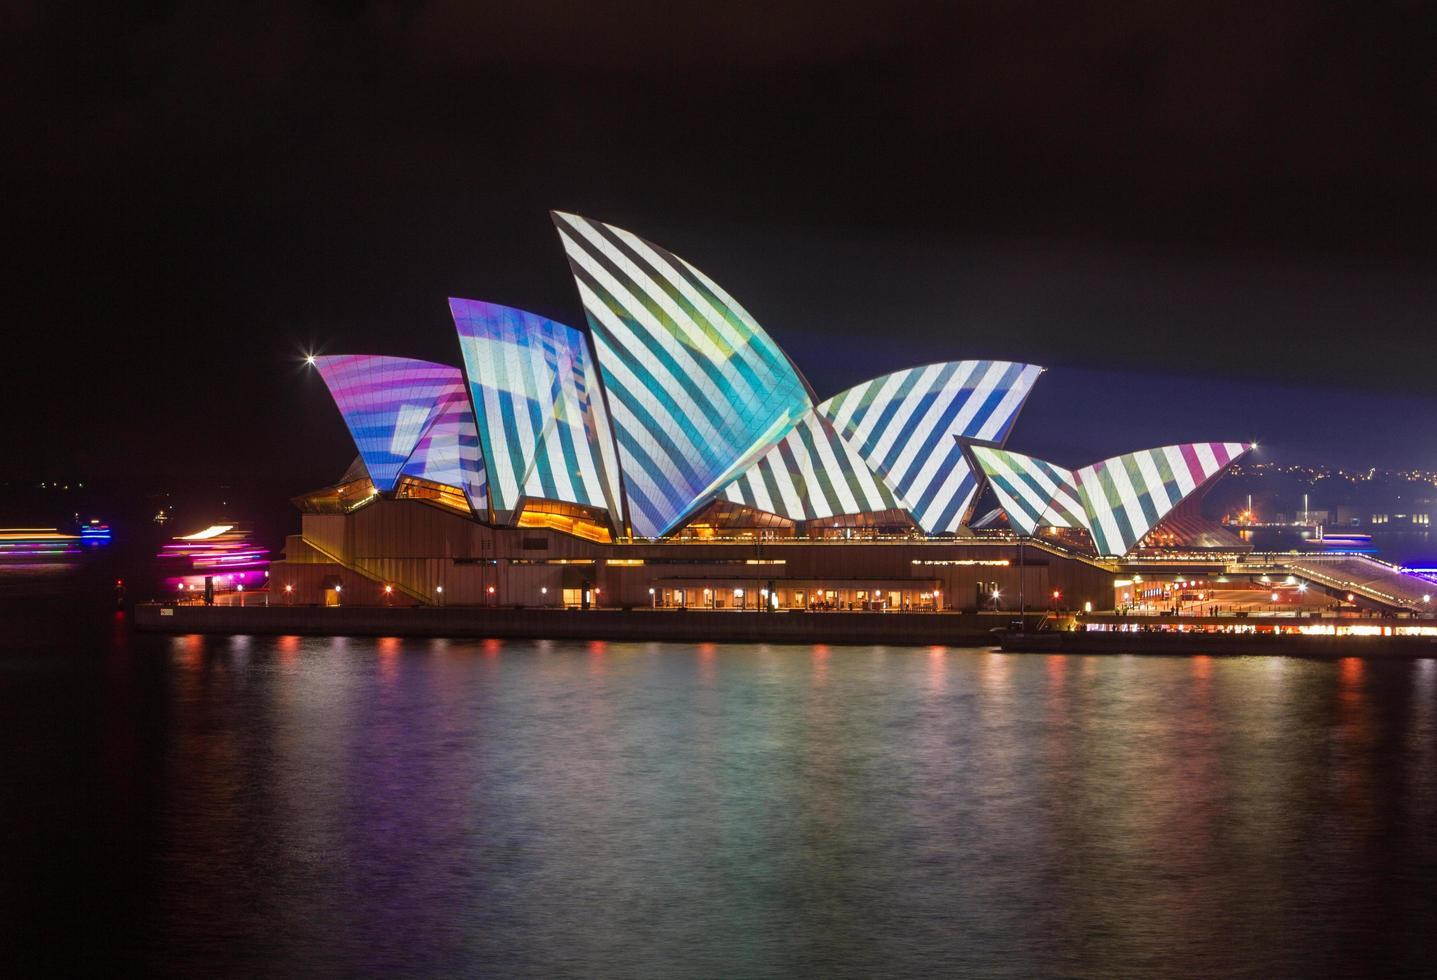 sydney, Australië, 2020 - lichtontwerp op het Sydney Opera House 's nachts foto